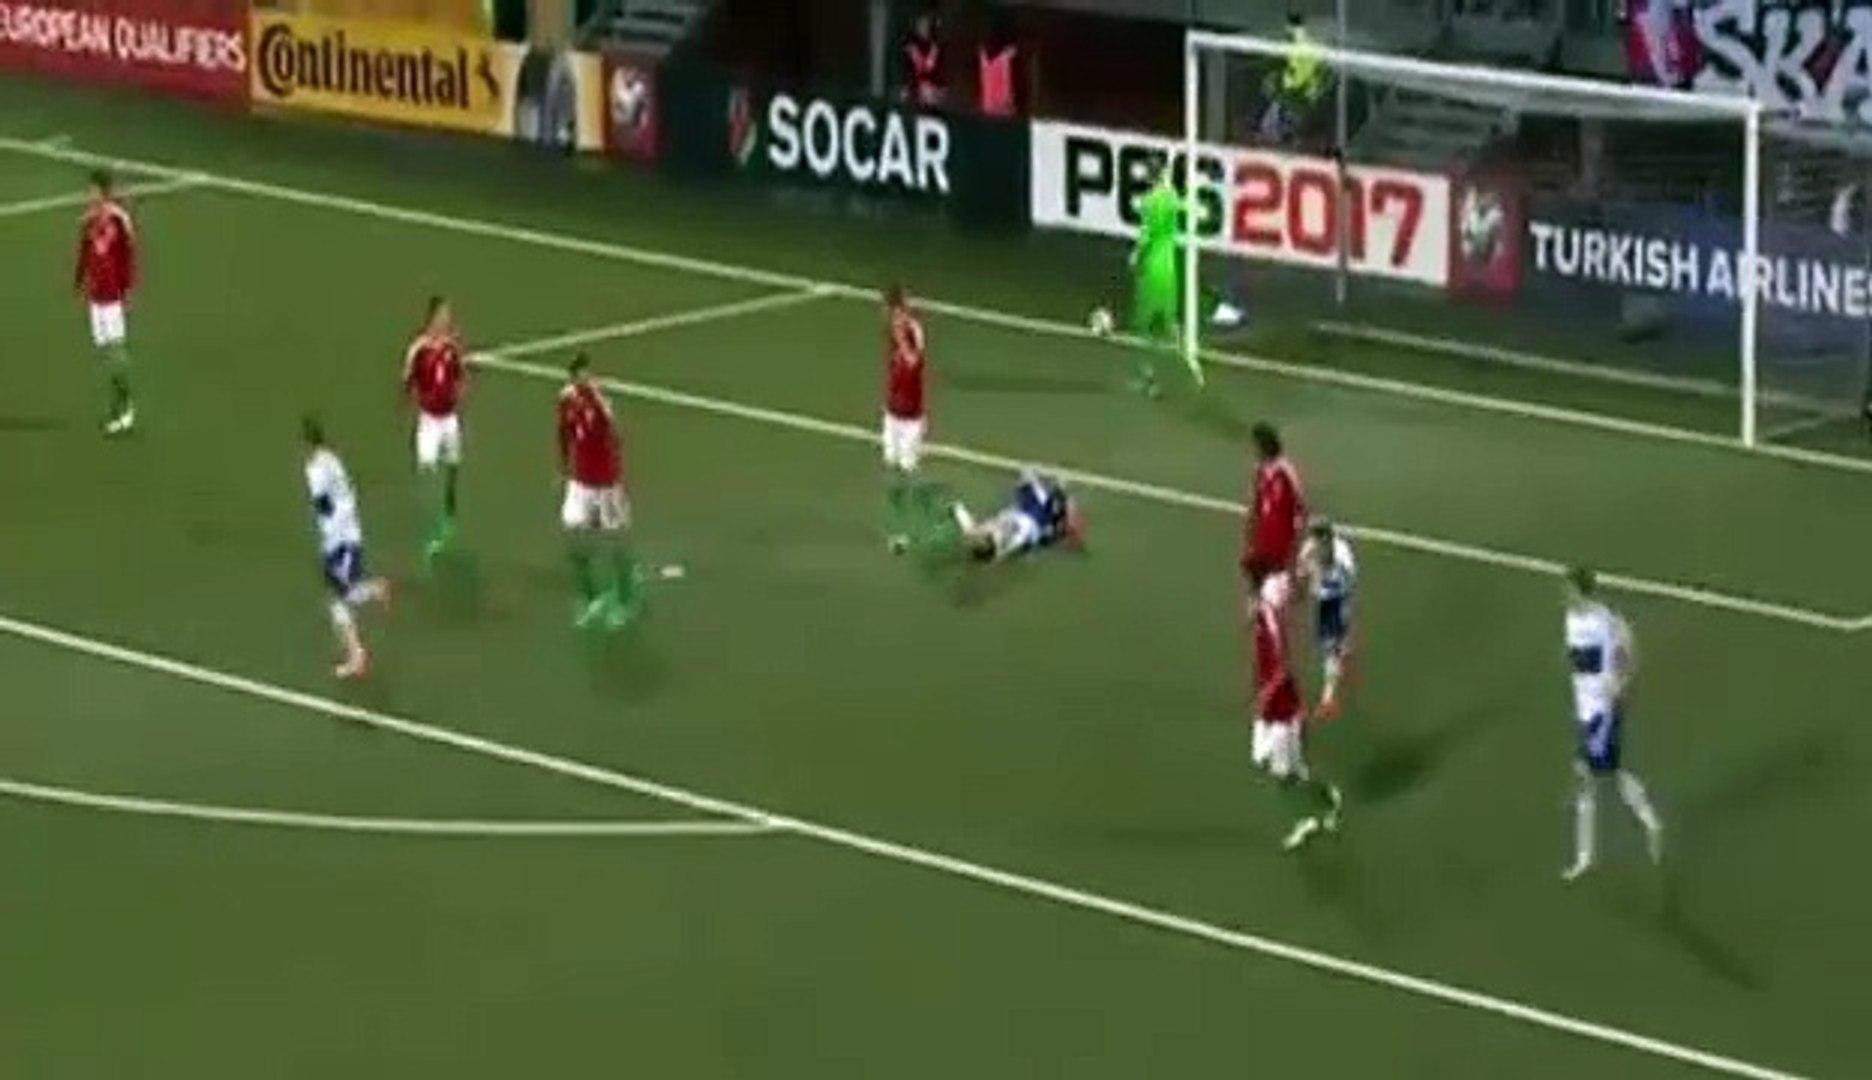 Faroe Islands 0-0 Hungary - Full Highlights Exclusive (06/09/2016)